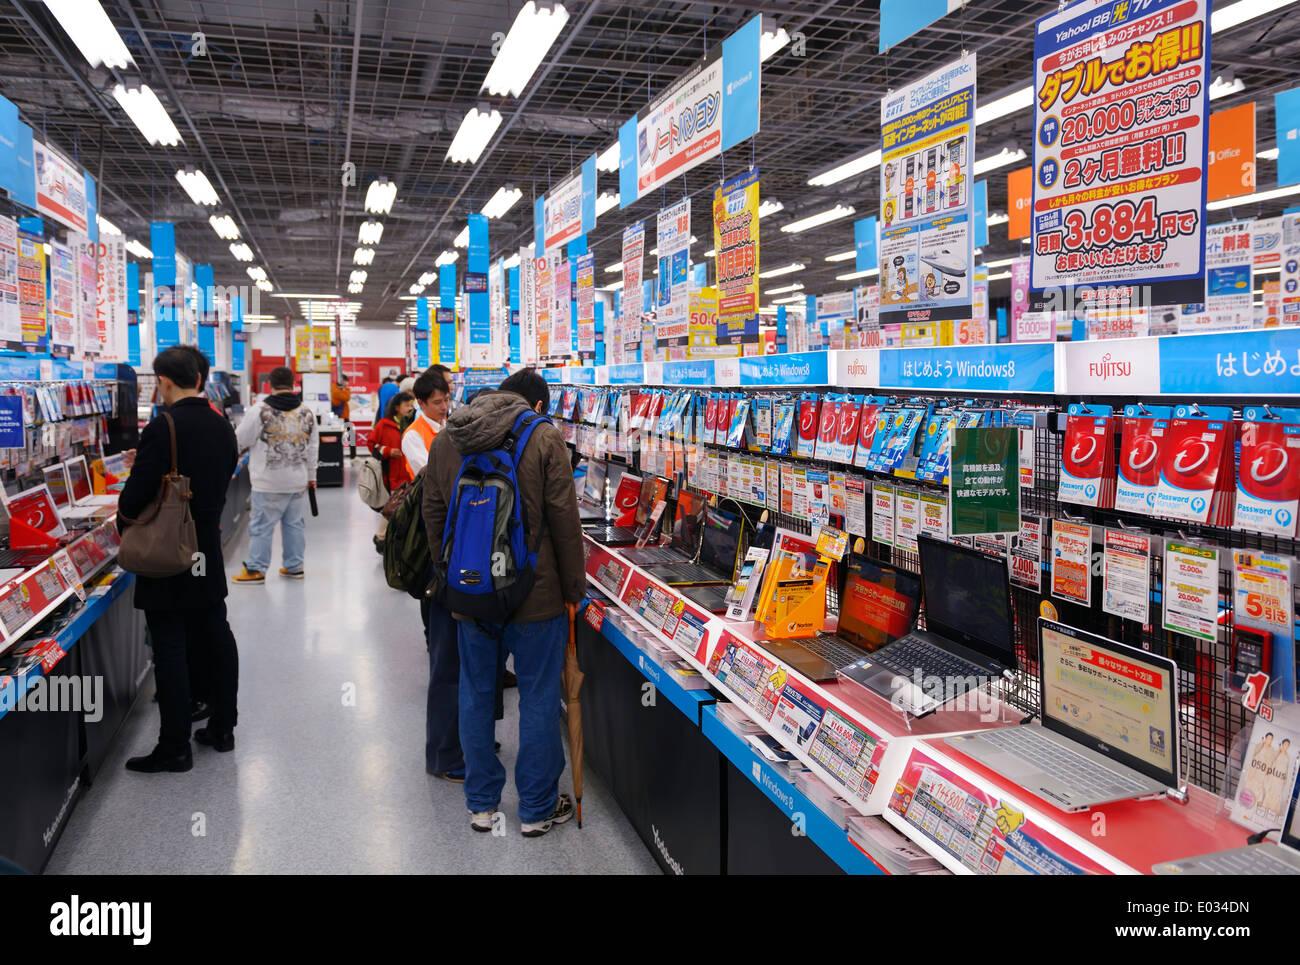 Menschen Sie bei großen Elektronik-Geschäft Yodobashi Kamera Yodobashi Akiba in Akihabara, Tokyo, Japan. Stockbild